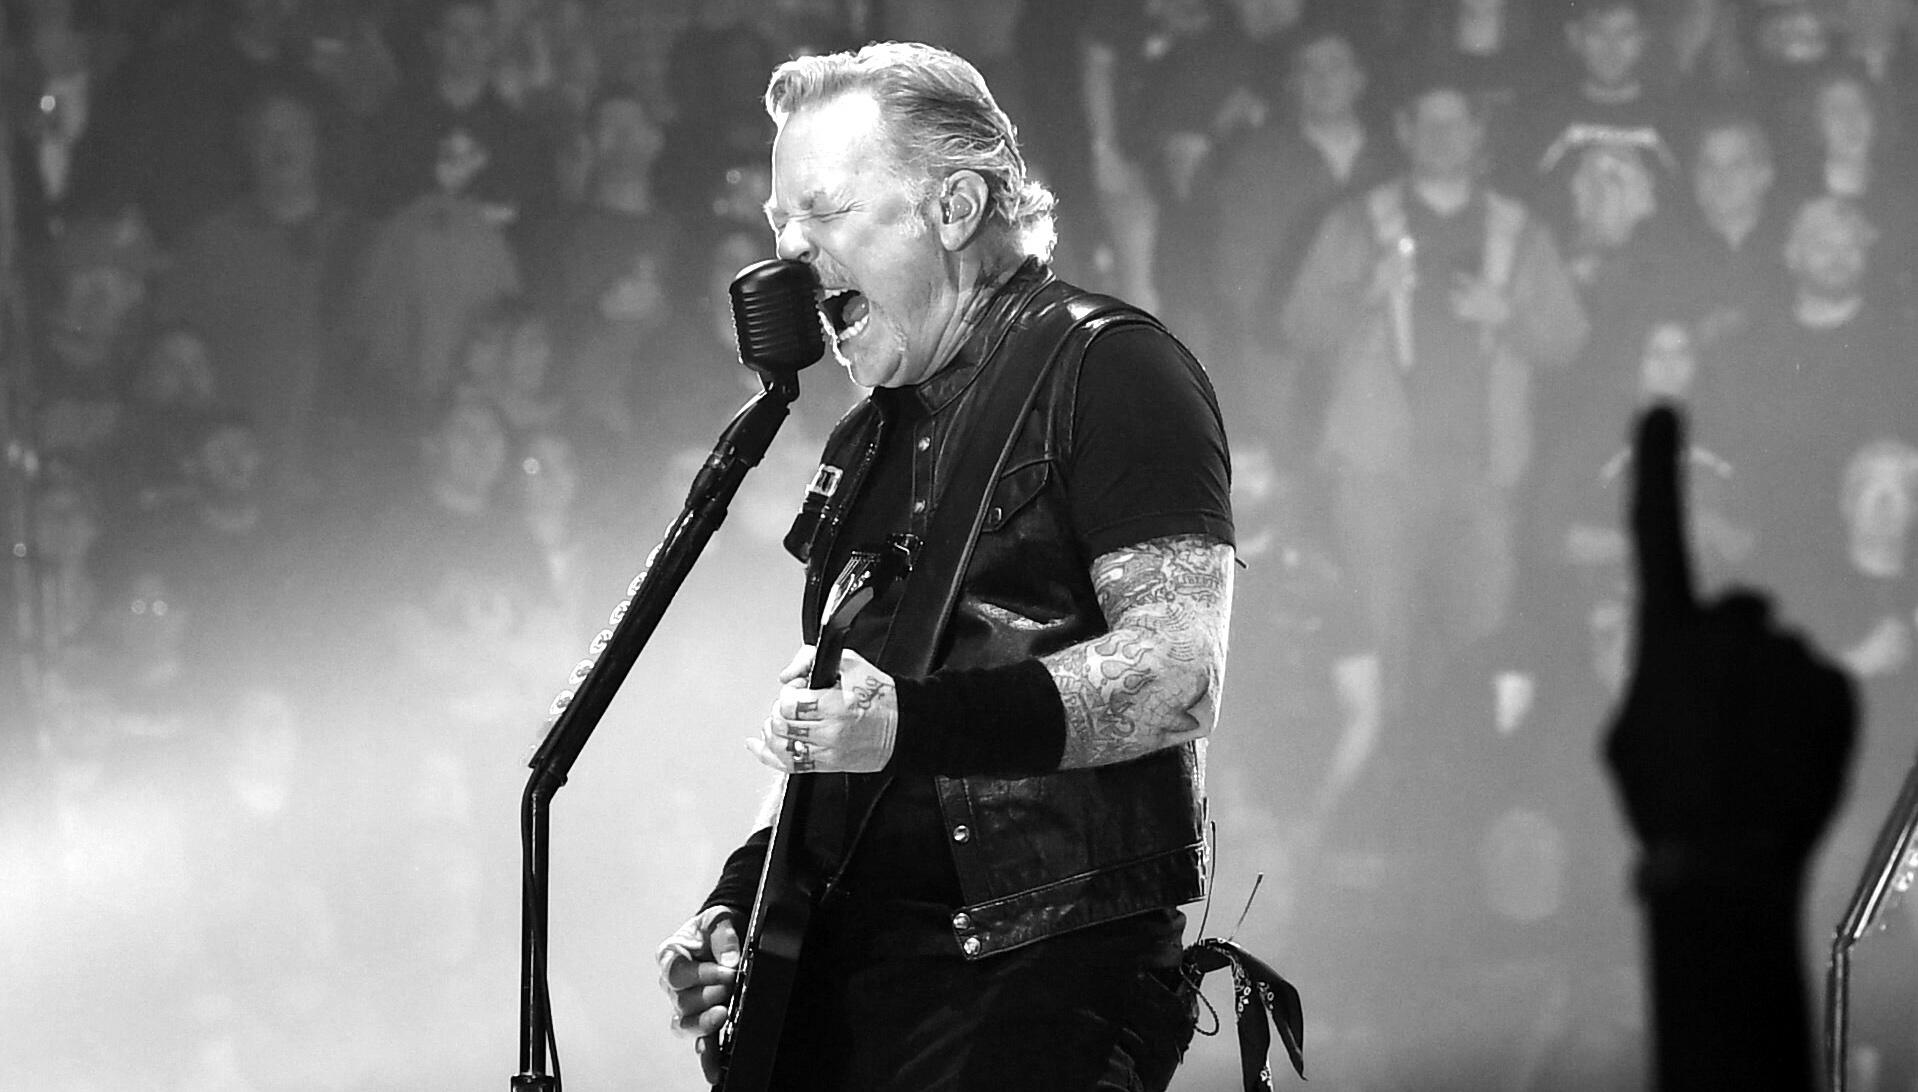 Metallica Announces 'Black Album In Black & White' Photo Book Due This Fall | iHeartRadio